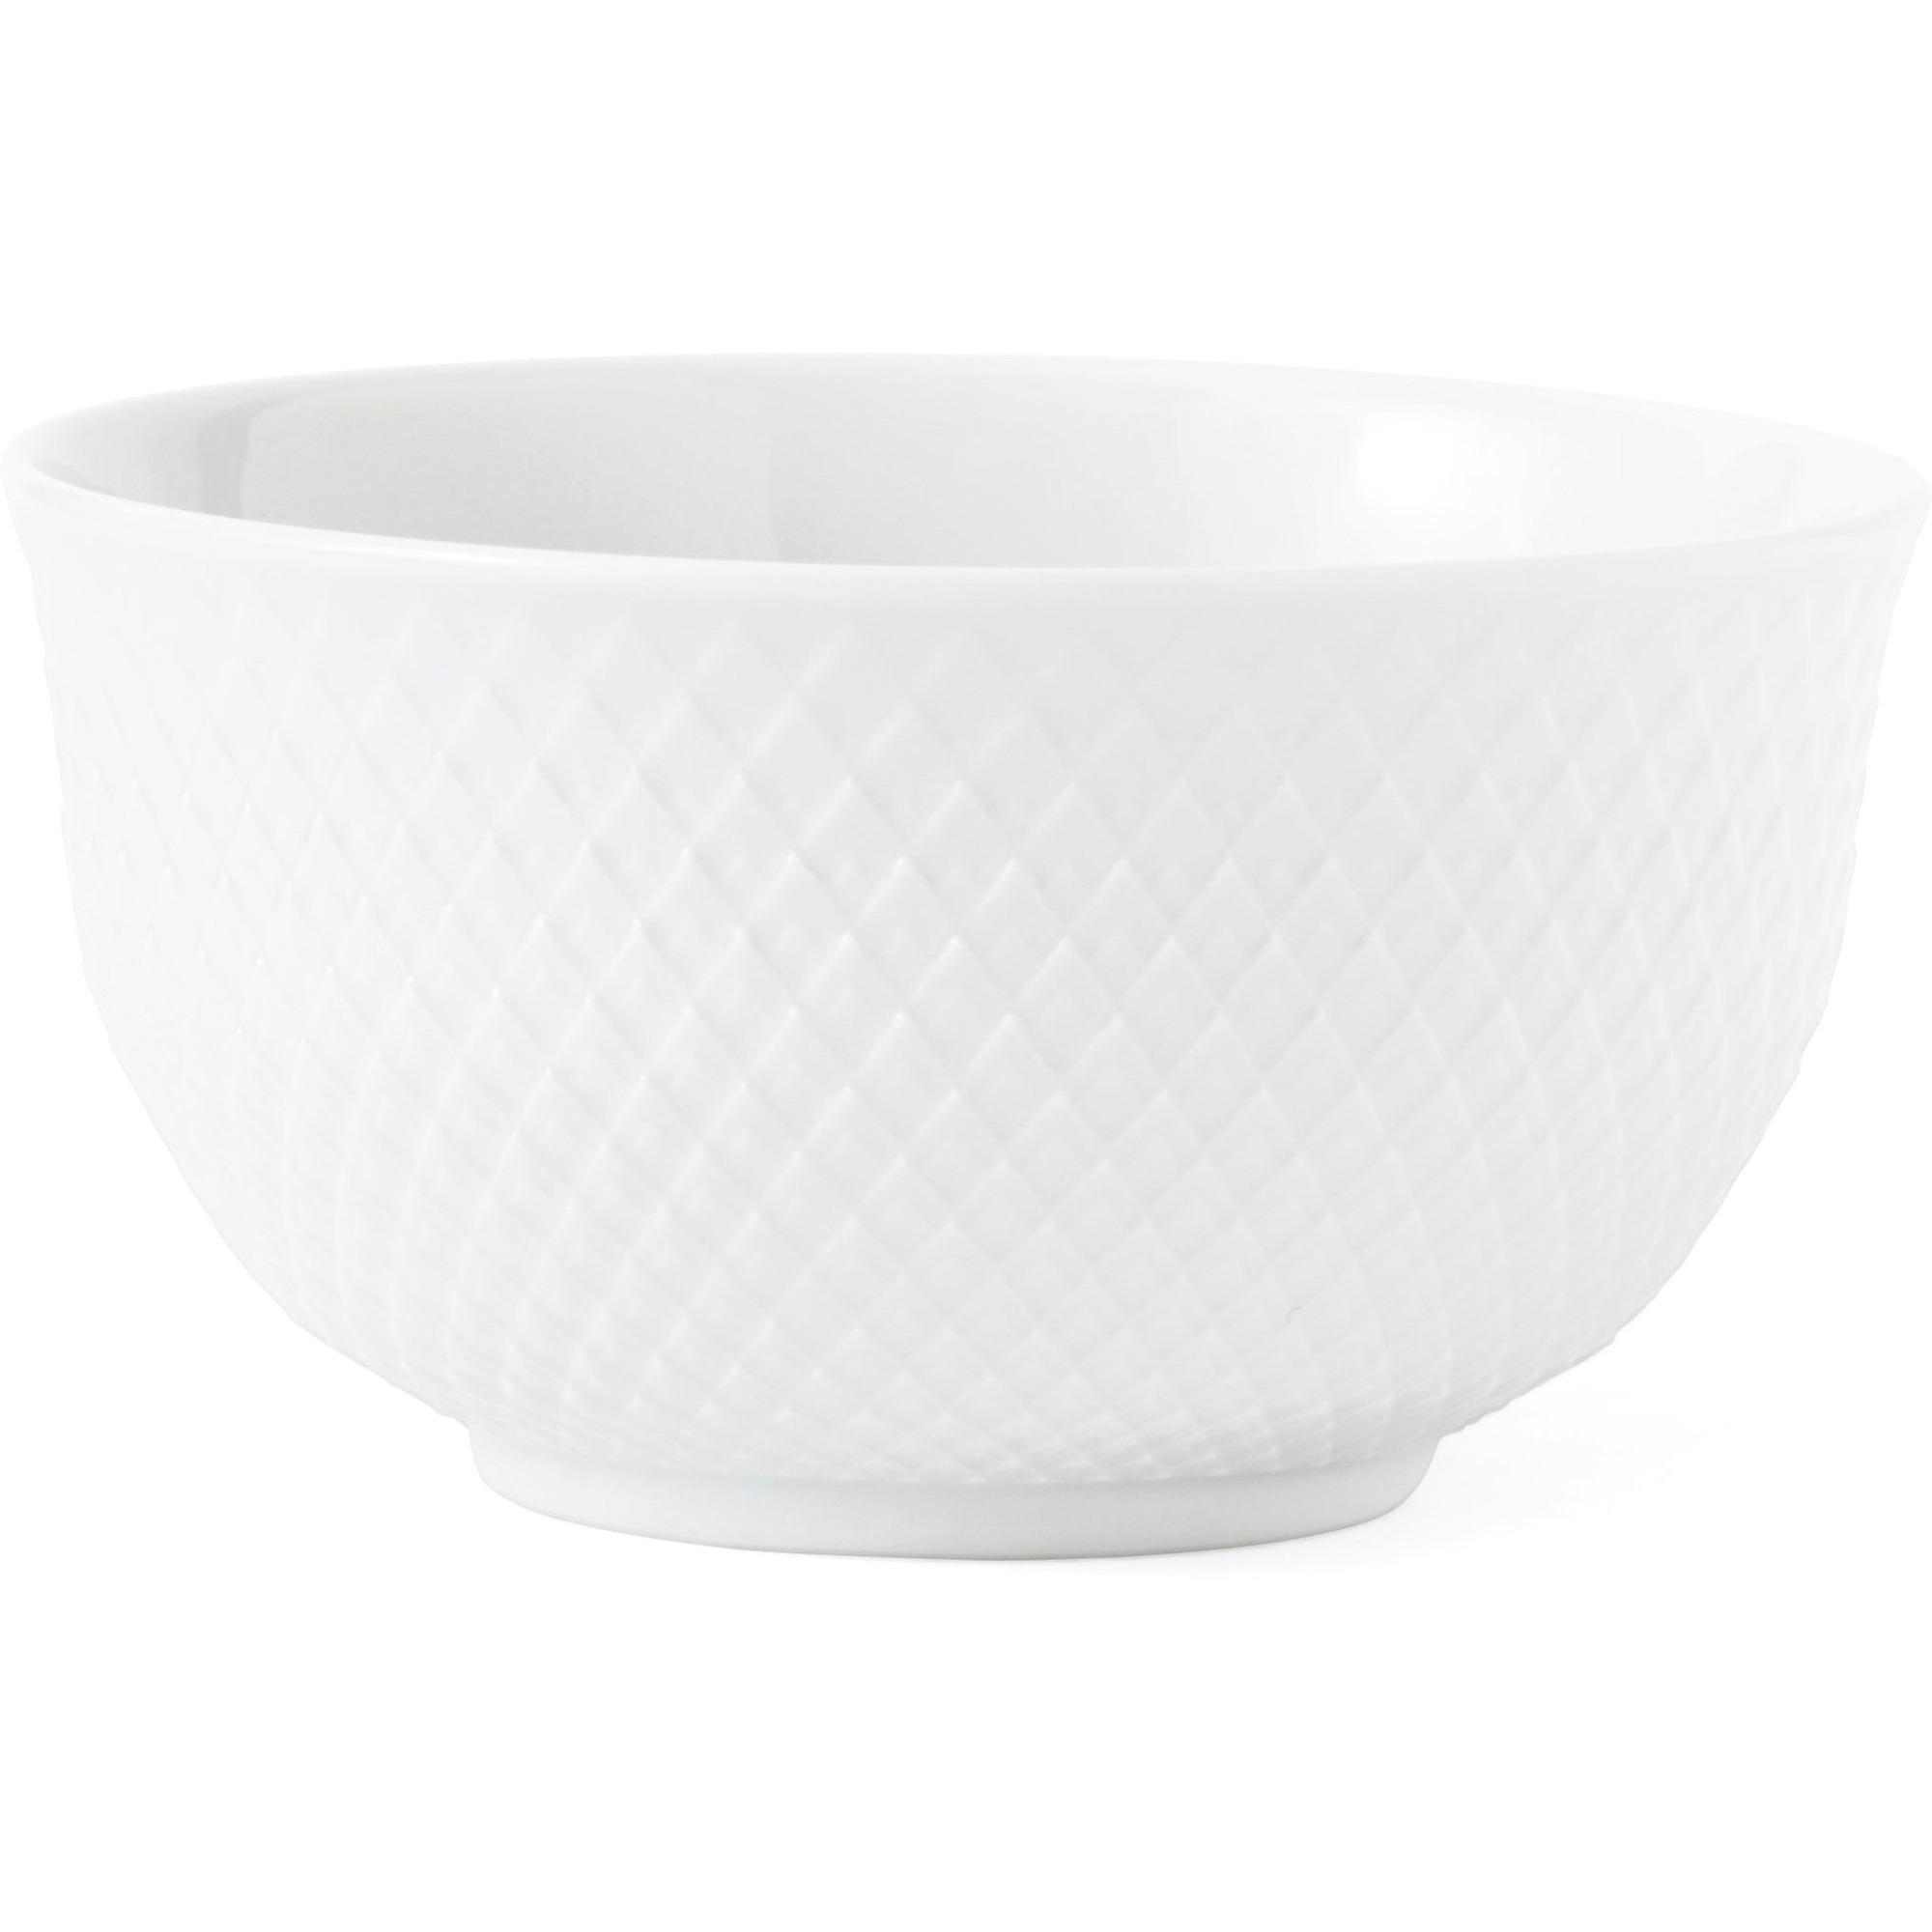 Lyngby Porcelæn Rhombe skål 35 cl.